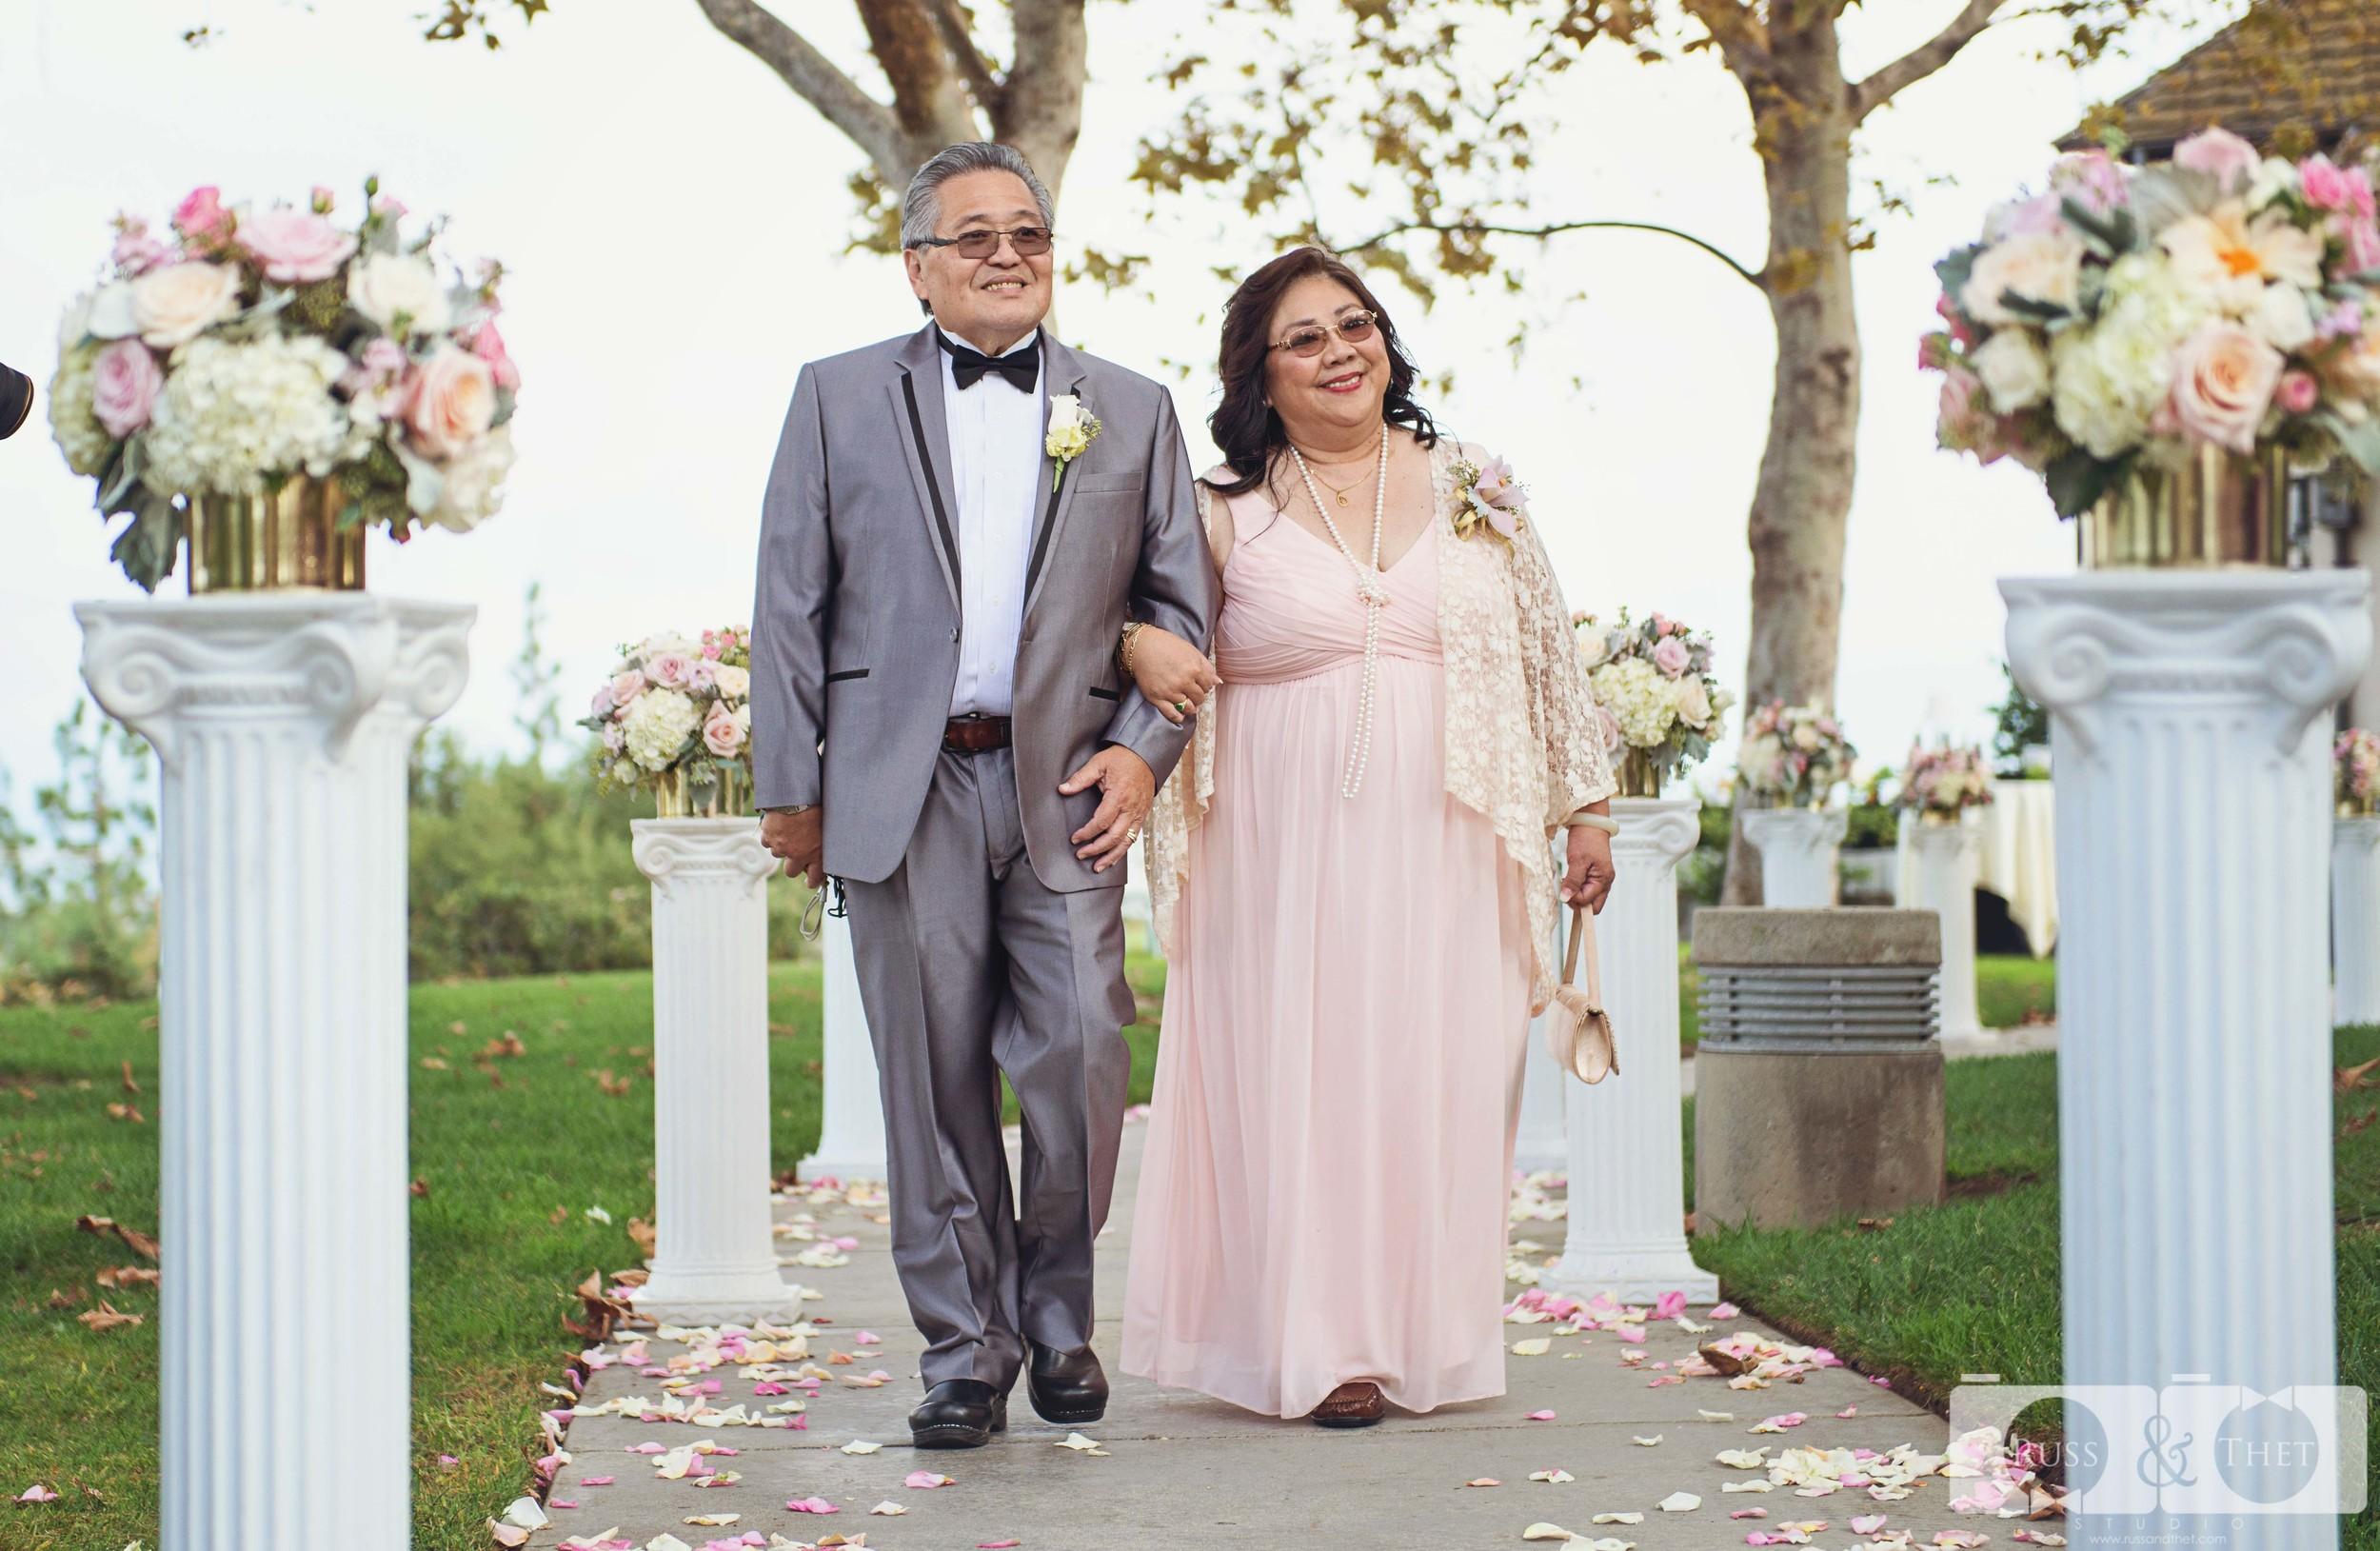 summit-house-fullerton-wedding-photographer-74.JPG